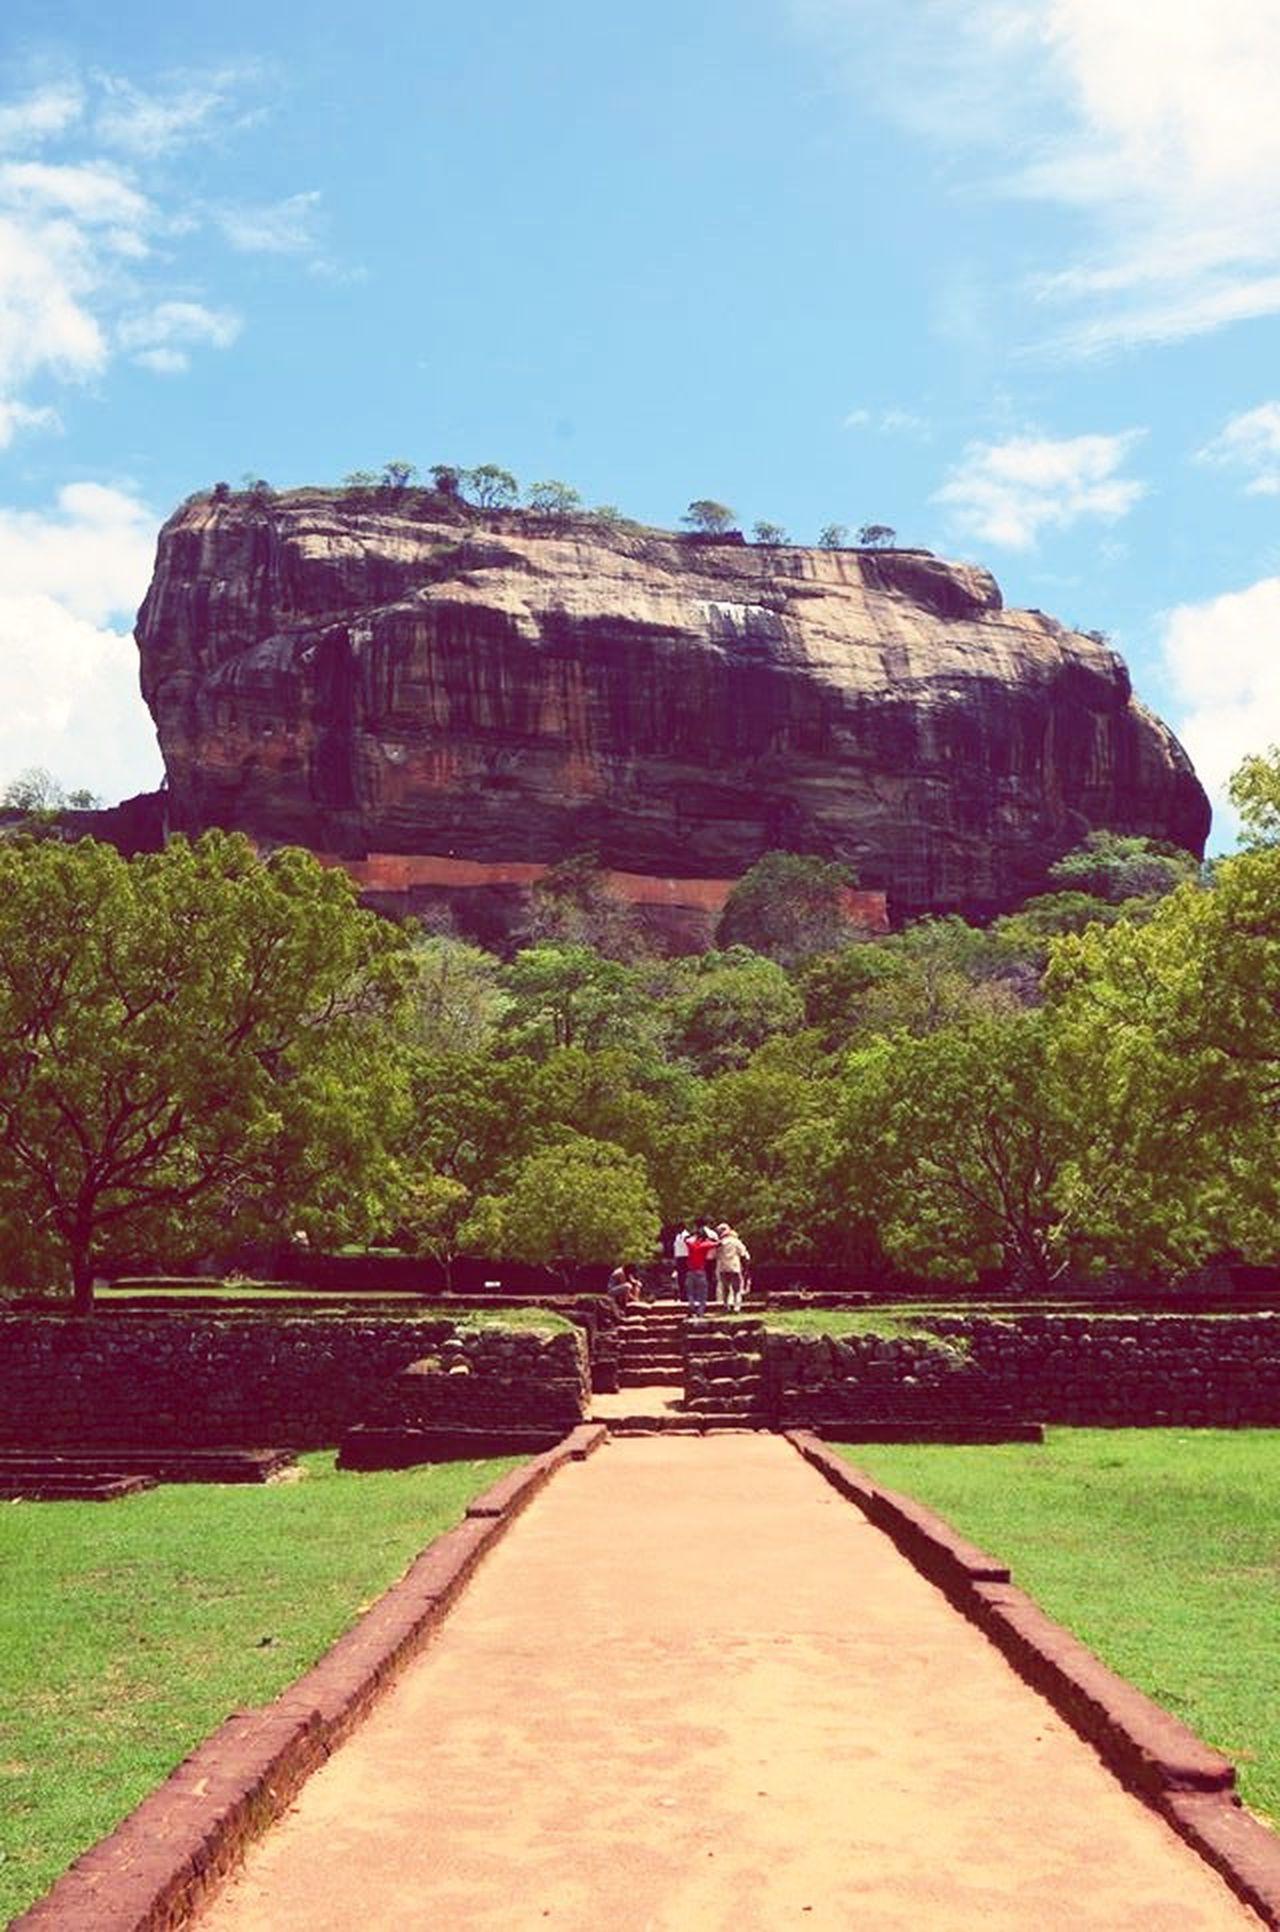 Holiday POV Taken on the way to The Rock of Fortress -Sigiriya, Sri Lanka. Sri Lanka Rockoffortress